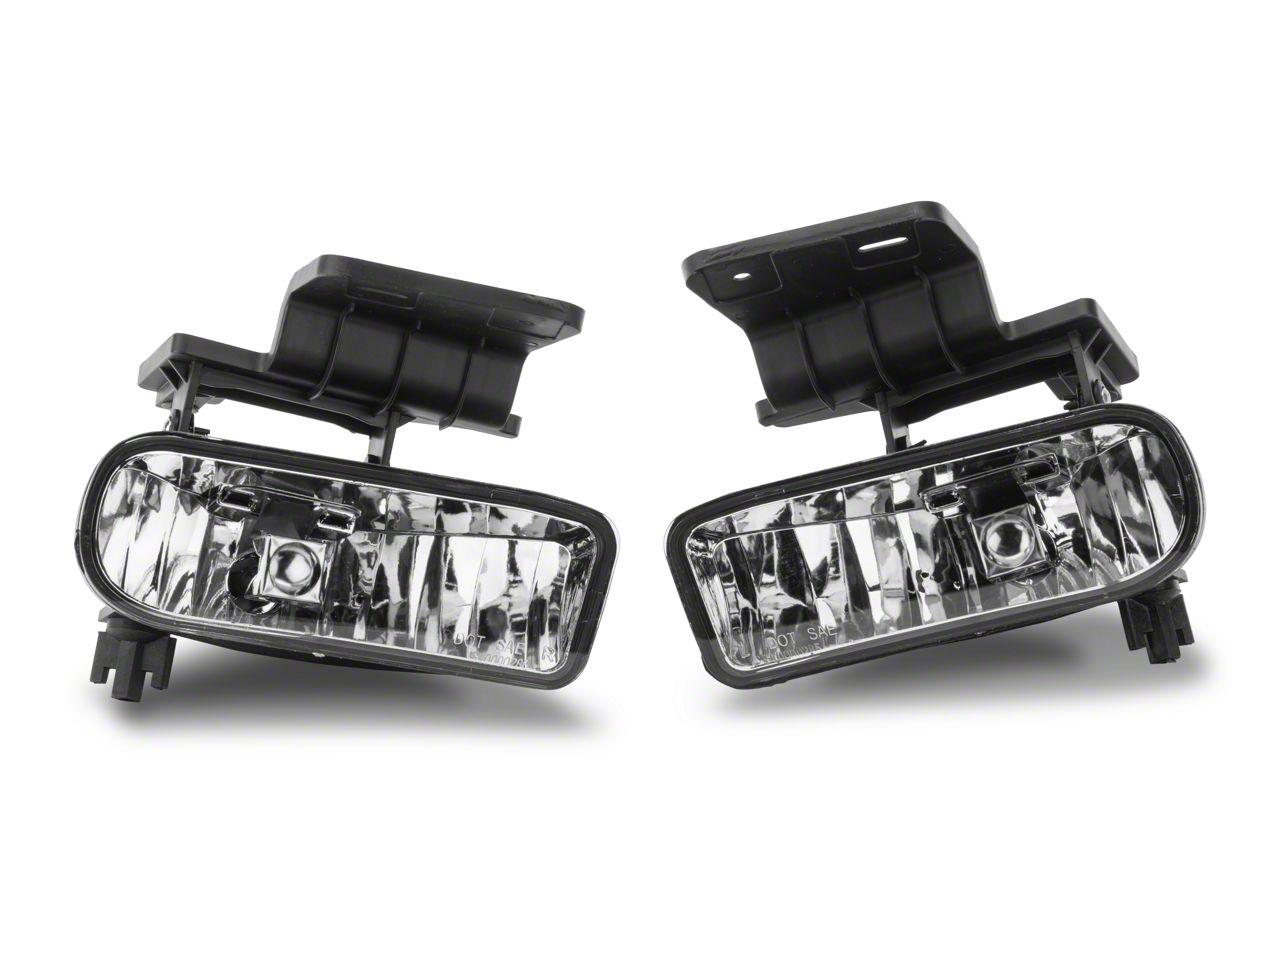 Axial Clear OE Style Fog Lights w/o Wiring Harness - Pair (99-02 Silverado 1500)